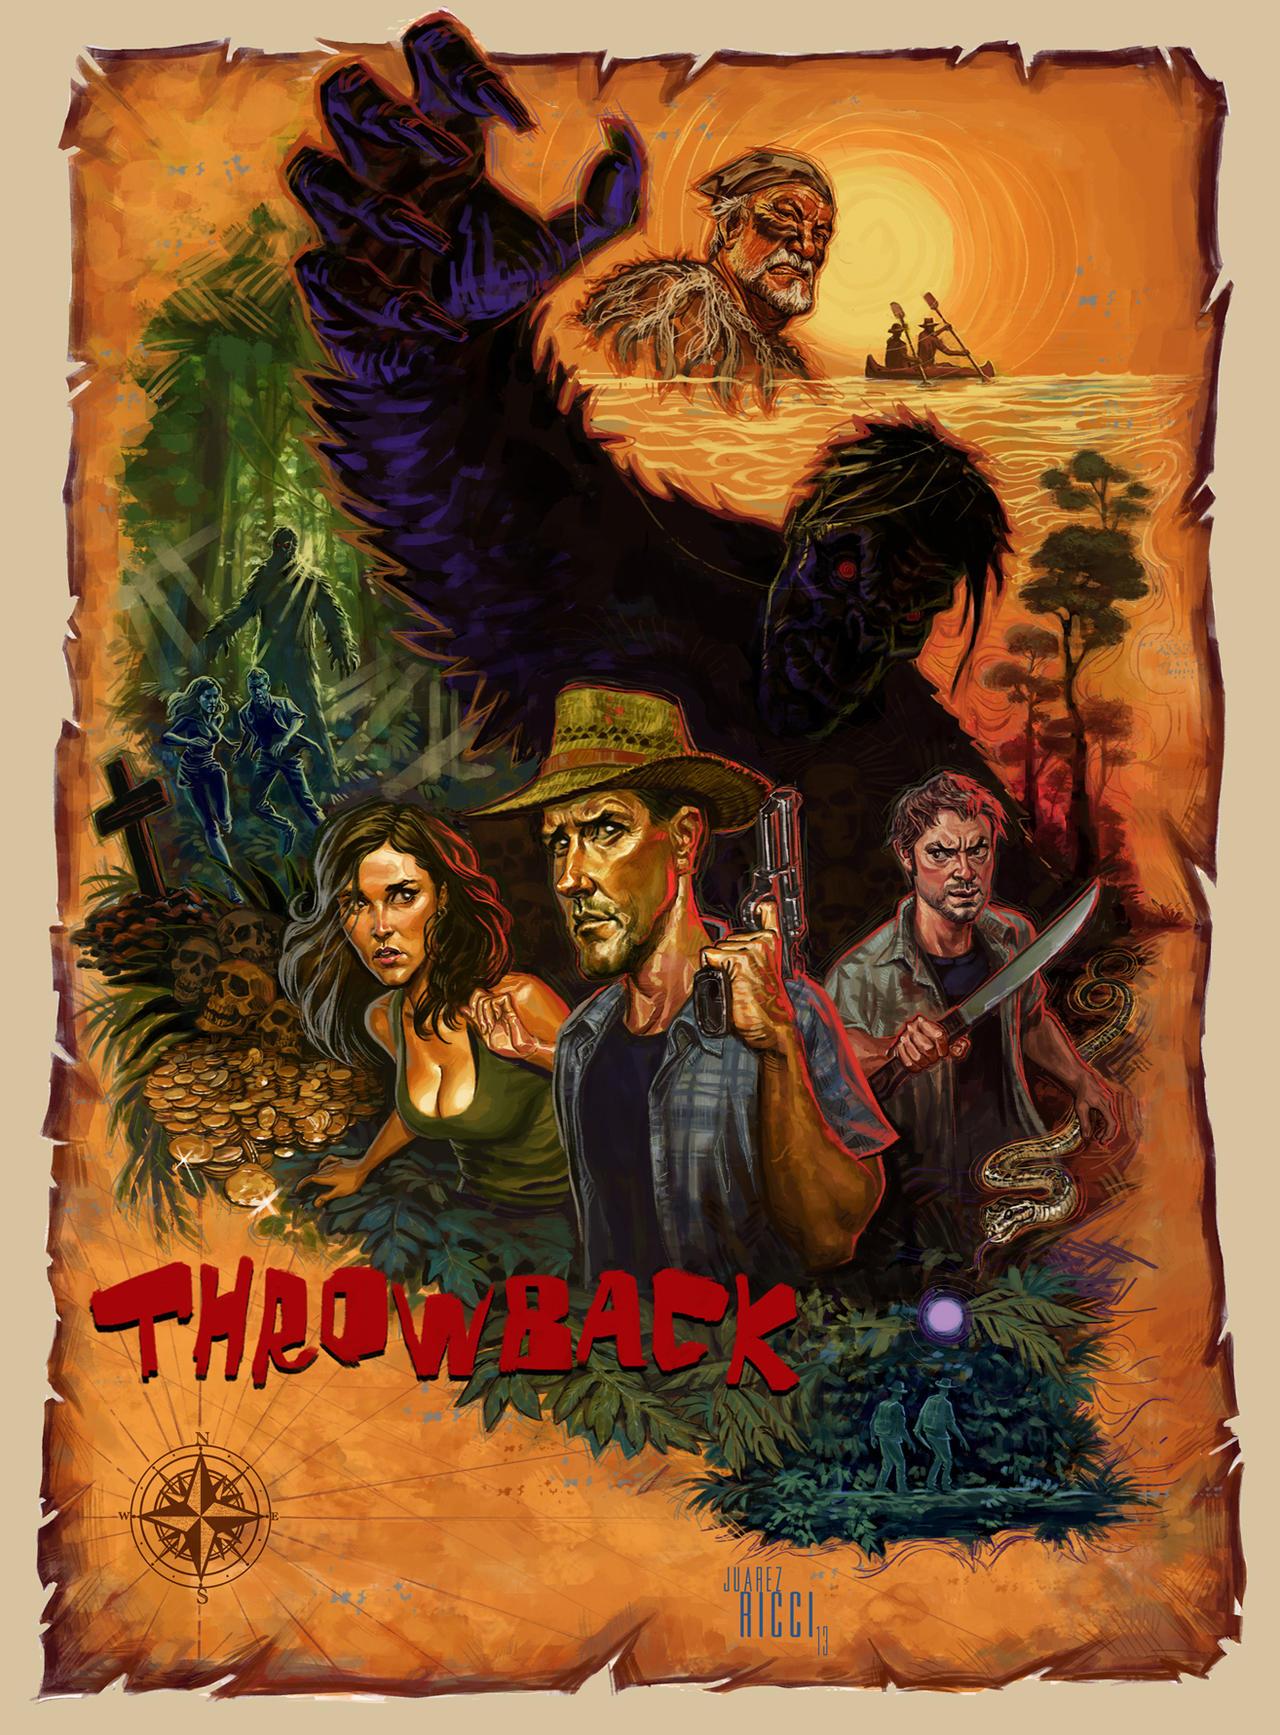 THROWBACK movie poster by juarezricci